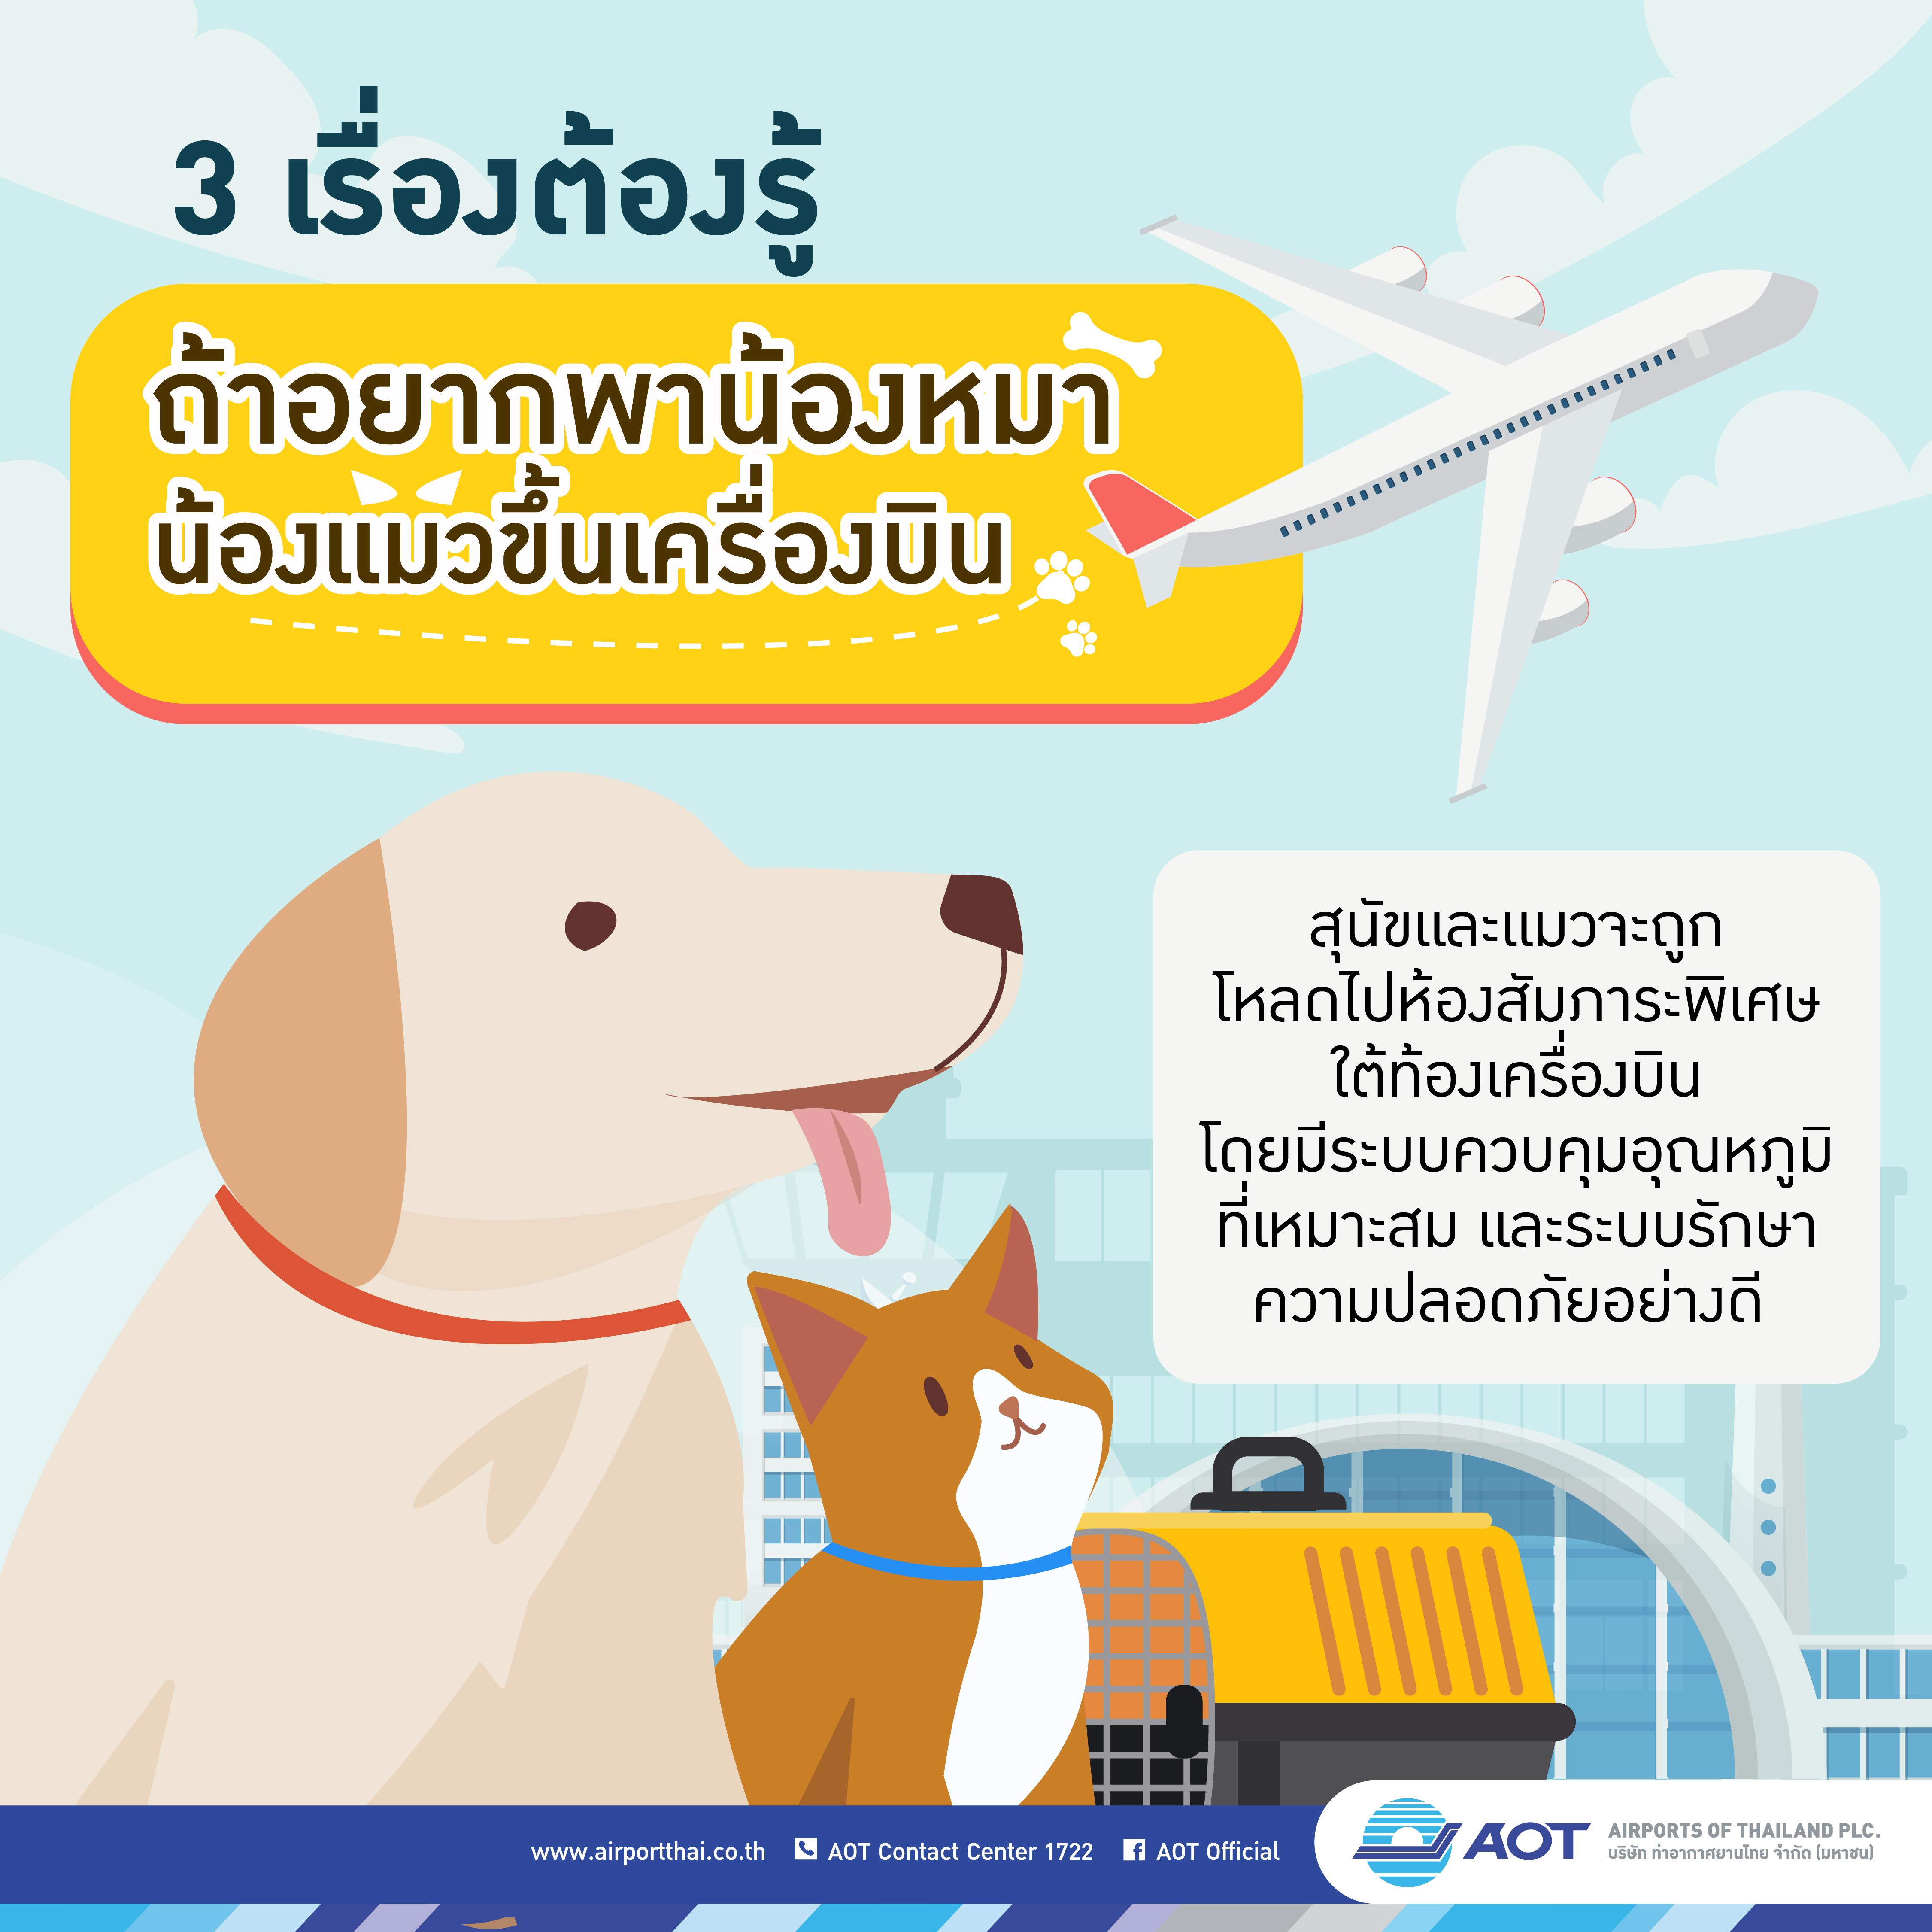 AOTcontent2019_Infographic_17_วิธีการนำสัตว์เลี้ยงร่วมเดินทางโดยเครื่องบิน_V2_20190805_Page-01